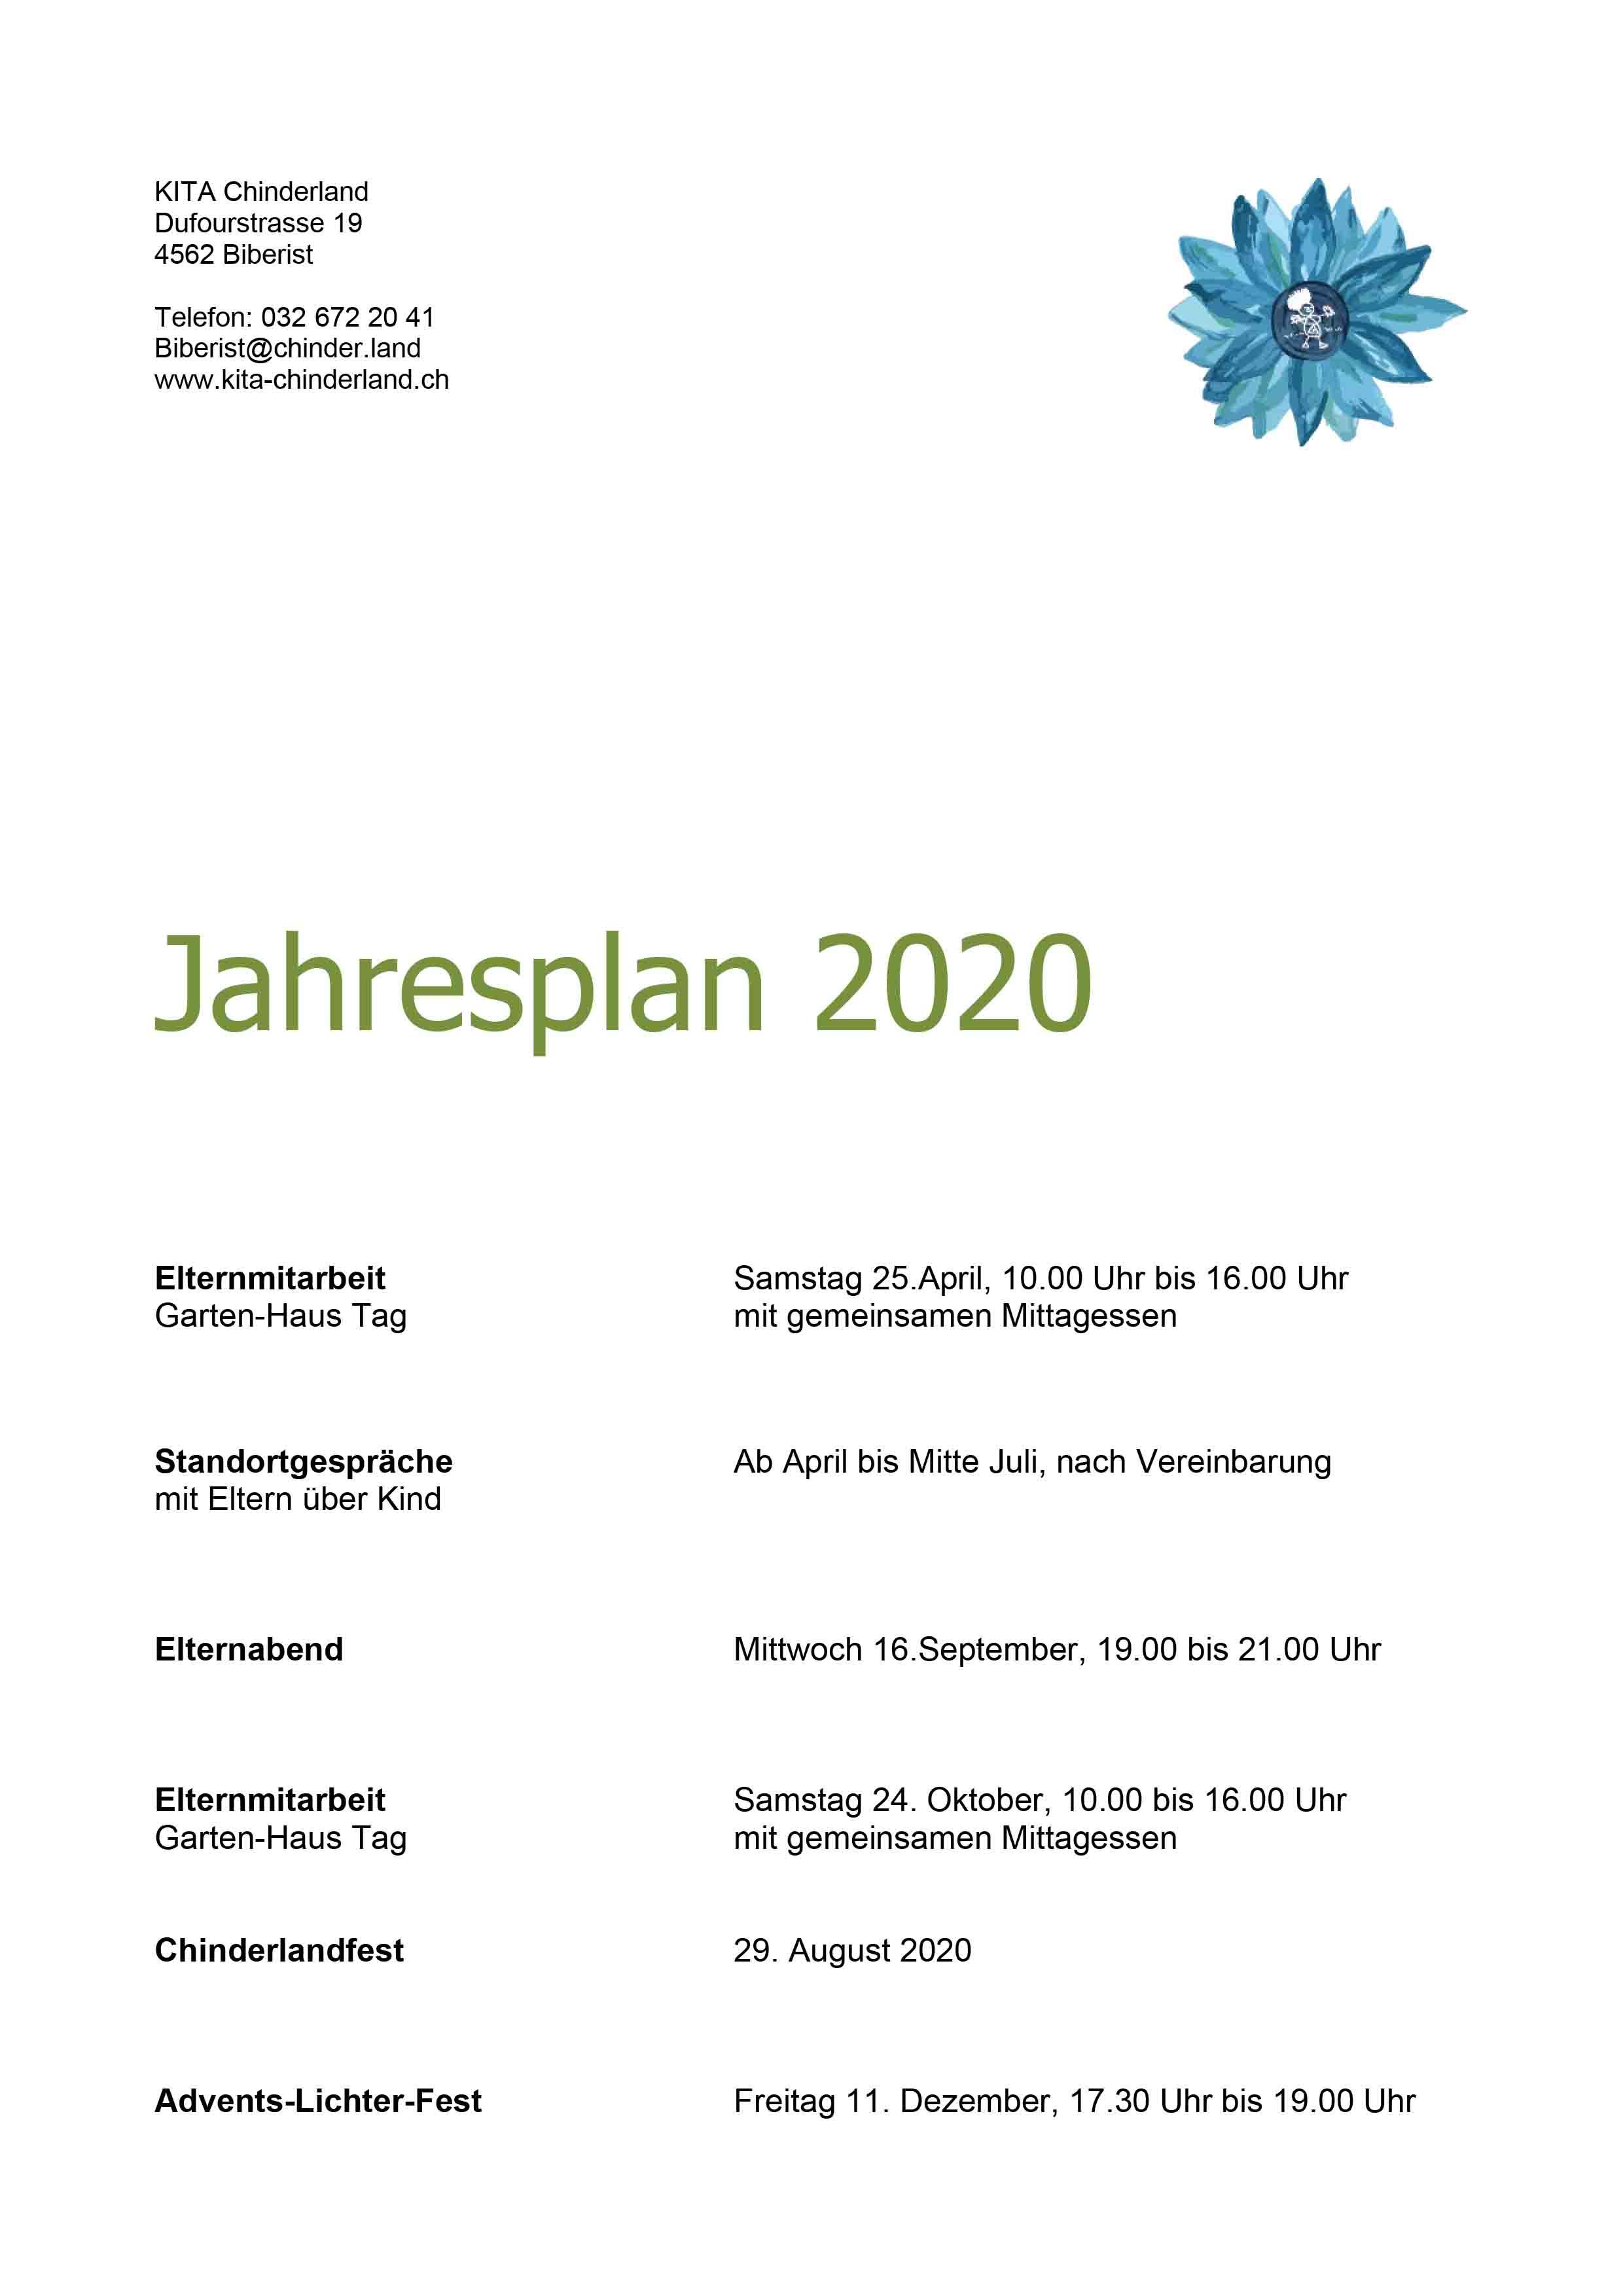 Jahresplan 2020 Biberist